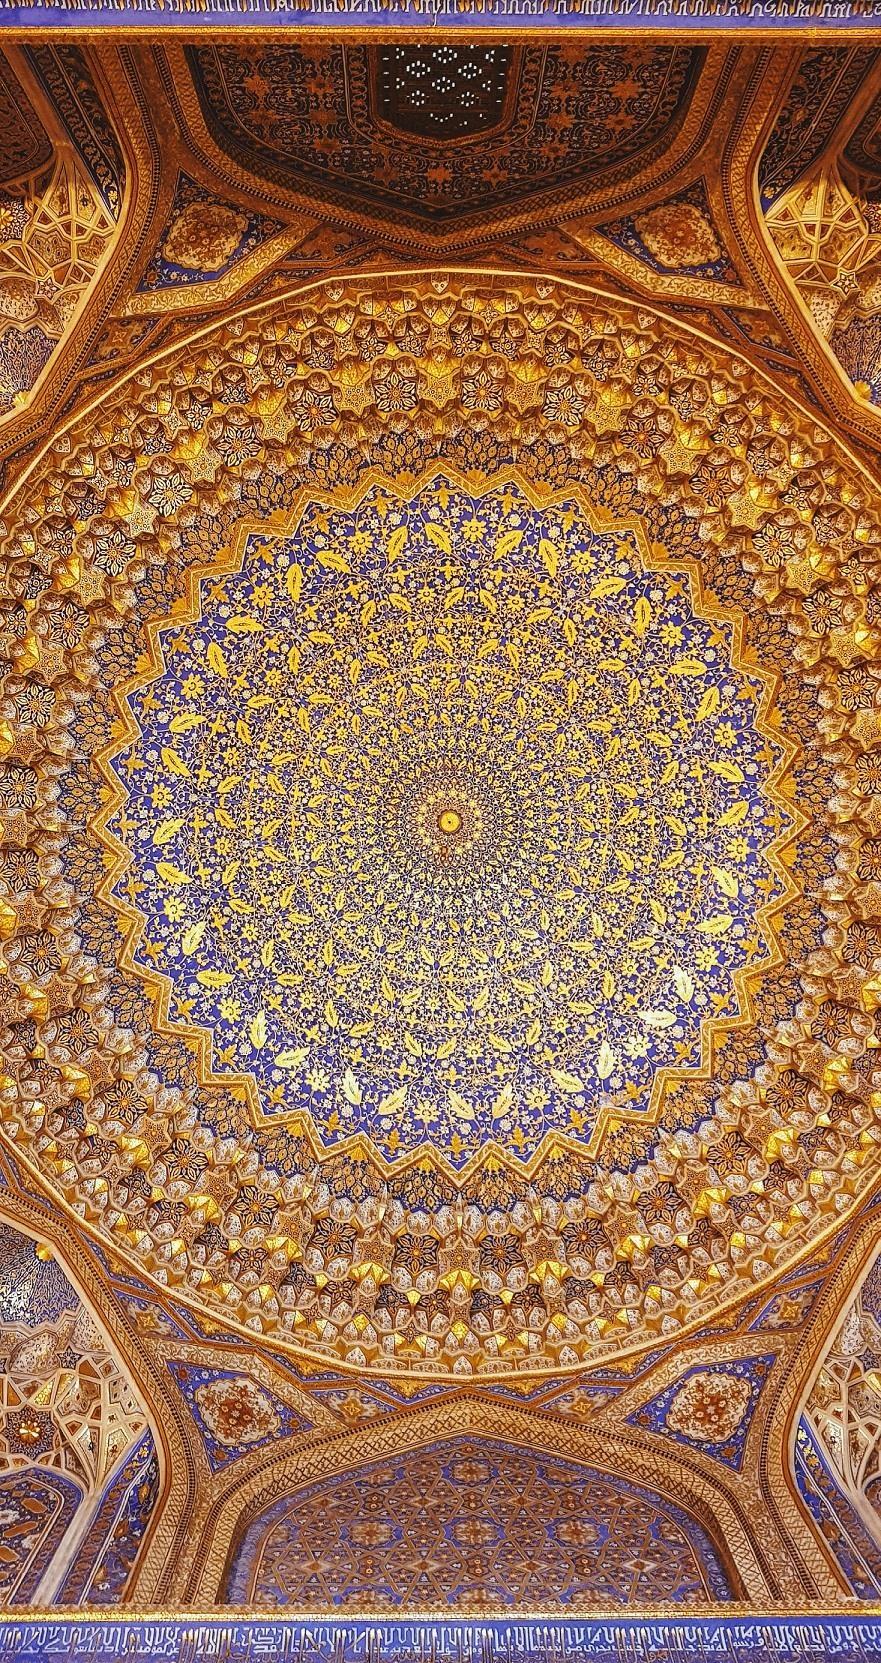 #Mytour: Uzbekistan va hanh trinh 13 ngay men theo Con duong To Lua hinh anh 18